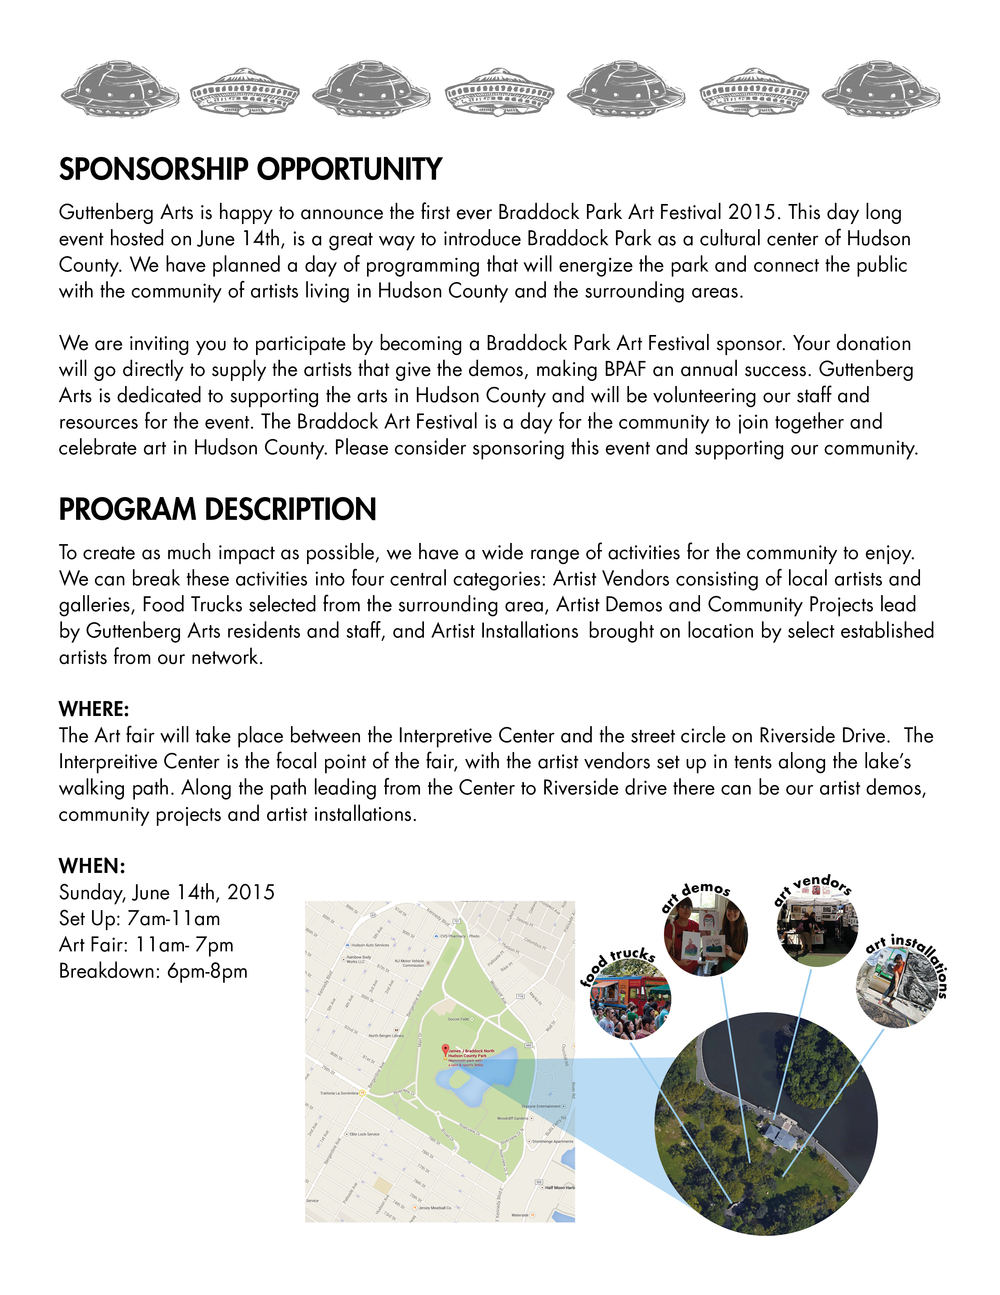 BPAF2015 Corporate Sponsorship v32.jpg